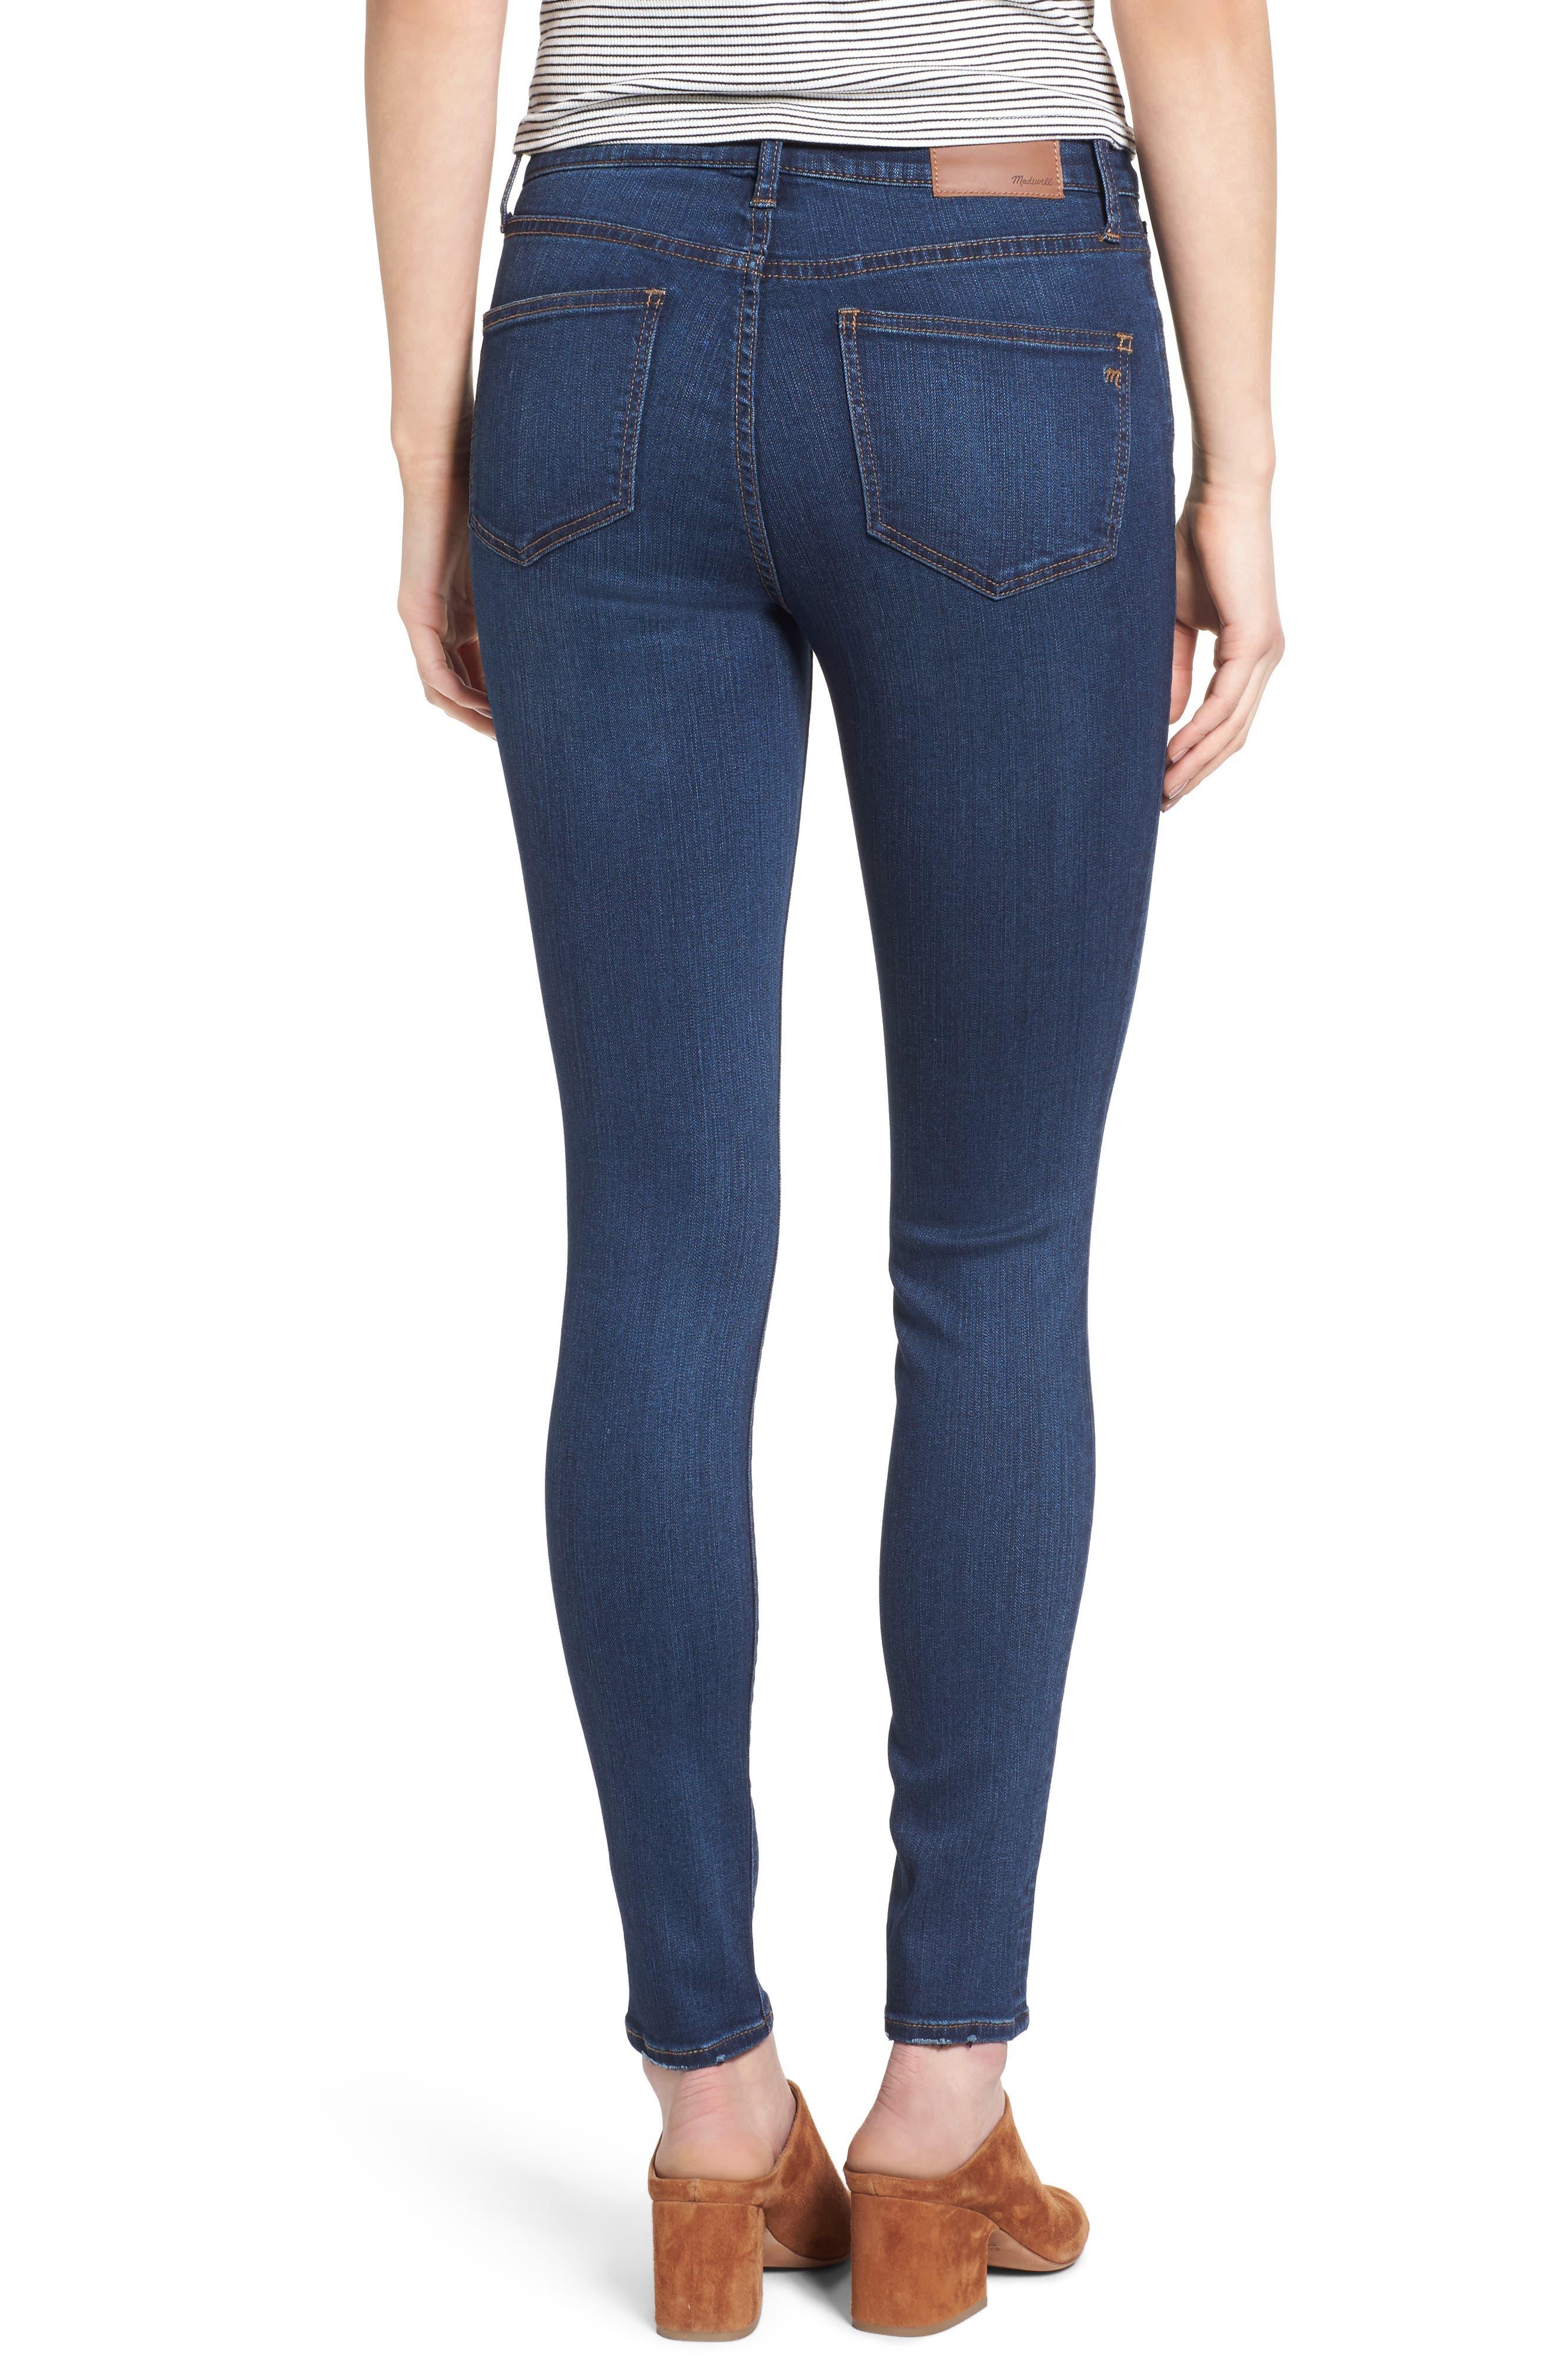 Alternate Image 2  - Madewell Roadtripper Jeans (Darryl Wash)